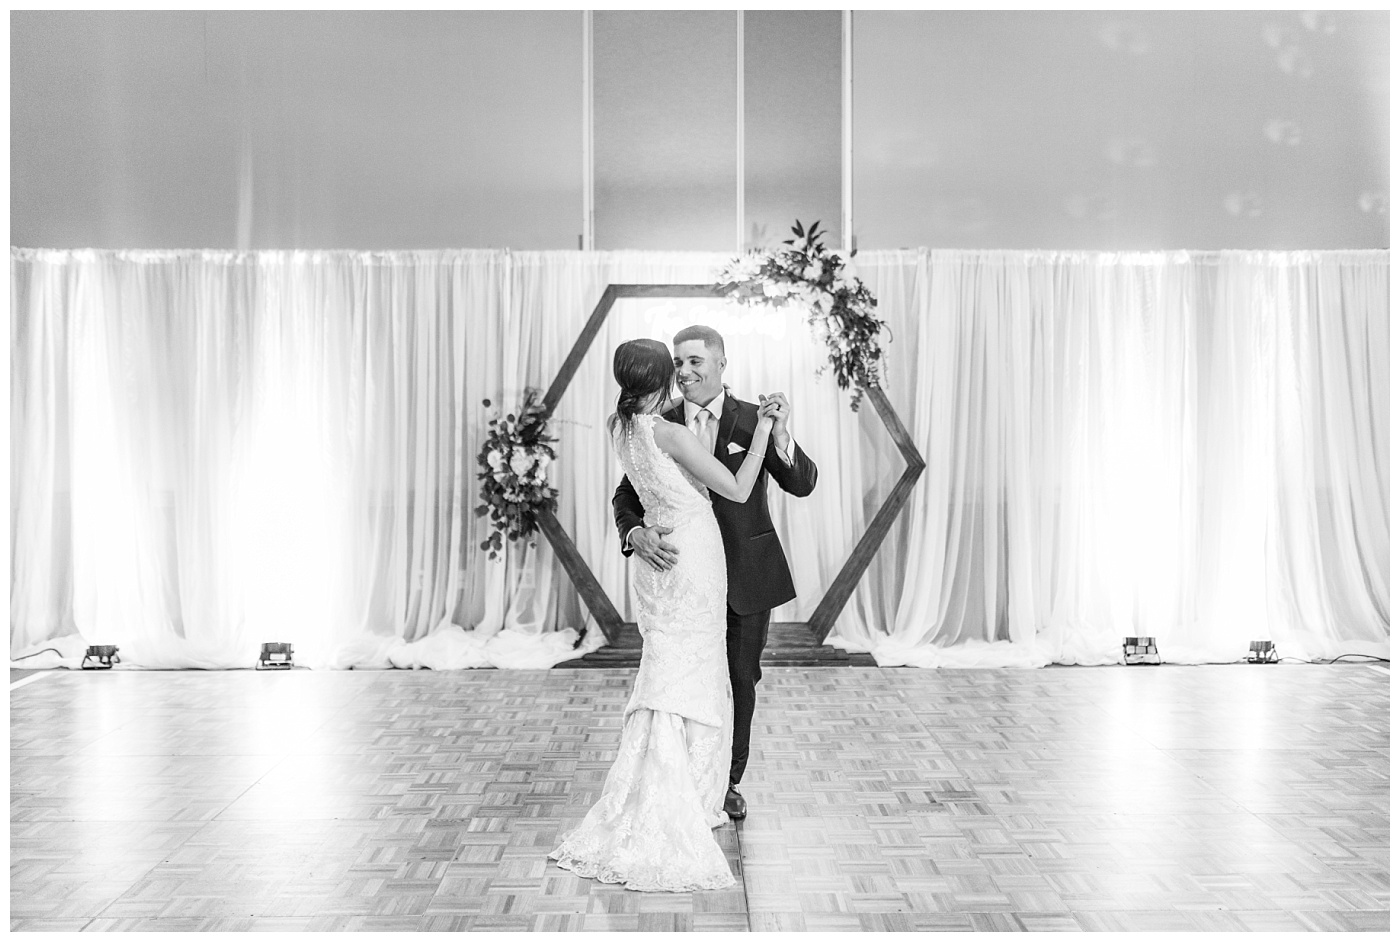 Stephanie Marie Photography Unitarian Universalist Society Church Ceremony Hotel Kirkwood Reception Cedar Rapids Iowa City Wedding Photographer Sean Madison Moore_0109.jpg